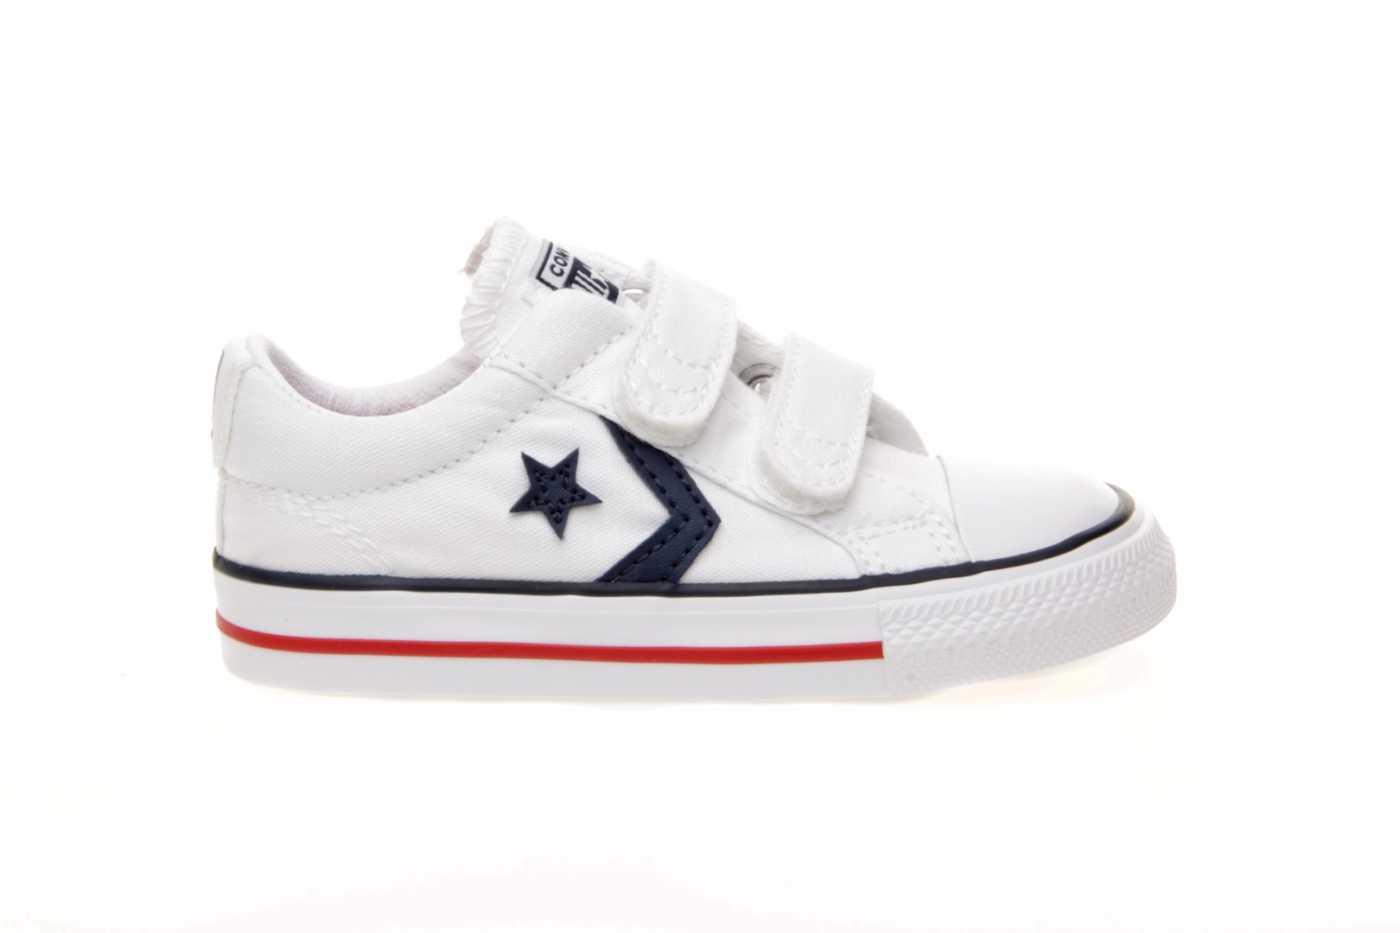 2b08dd8e794f5 Comprar zapato tipo JOVEN NIÑO estilo LONA COLOR BLANCO LONA